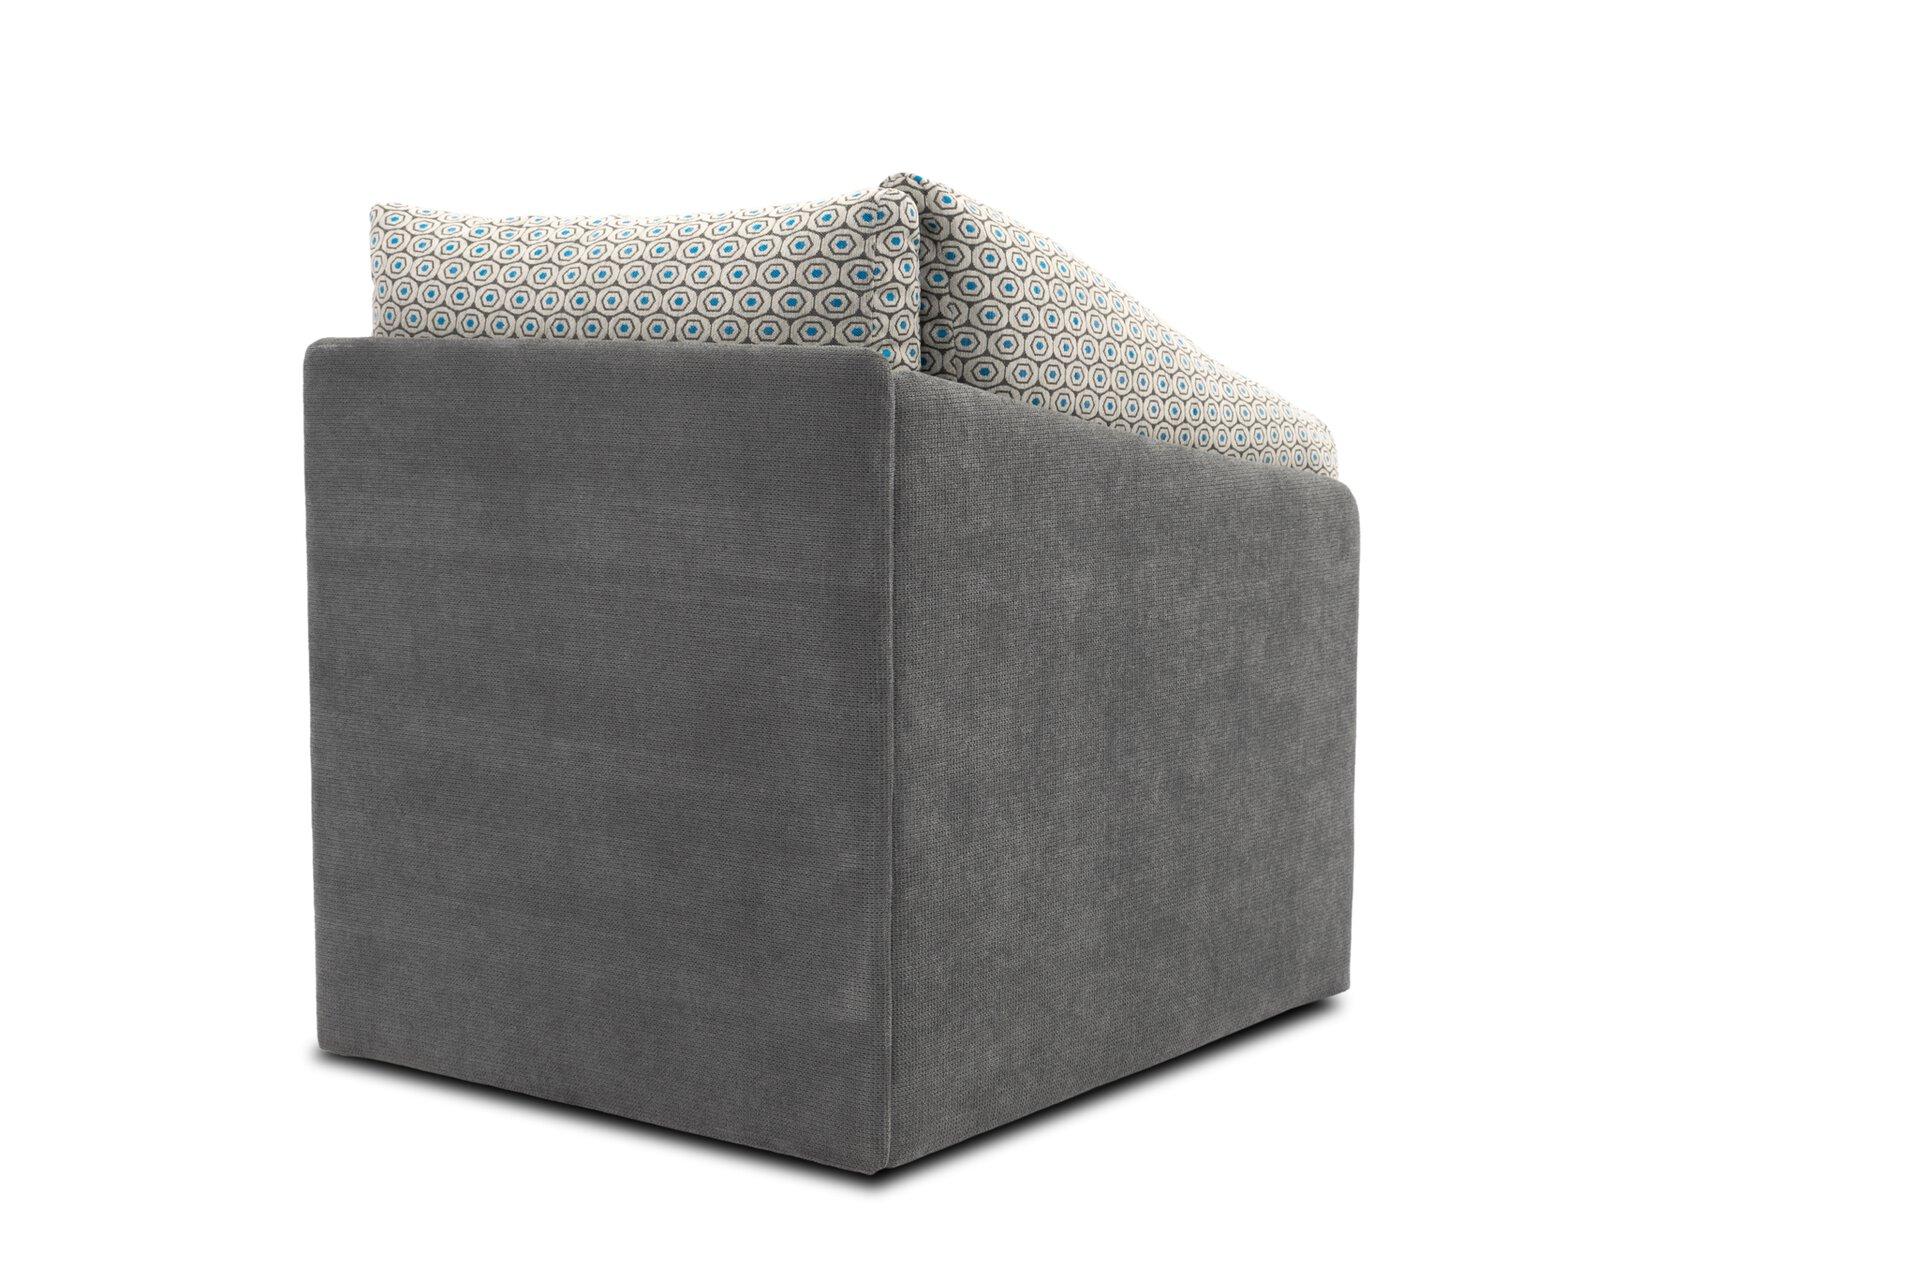 Sofa 1-Sitzer DELTA tiny.collection Textil 116 x 83 x 81 cm